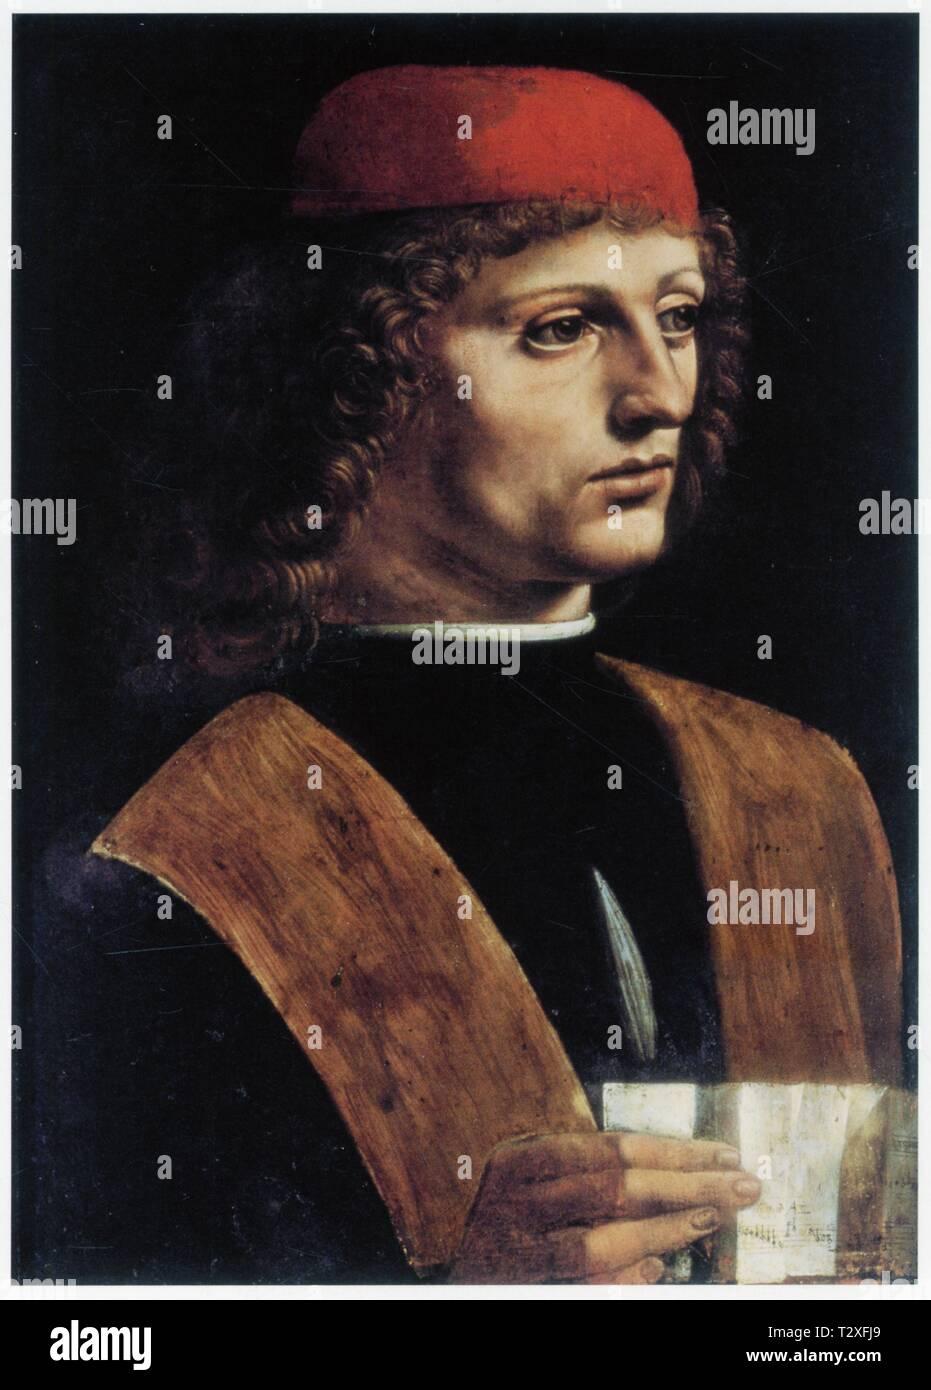 LEONARDO DA VINCI.PORTRAIT OF A YOUNG MAN.1490.OIL ON WOOD.44.7 CM X 32 CM - Stock Image